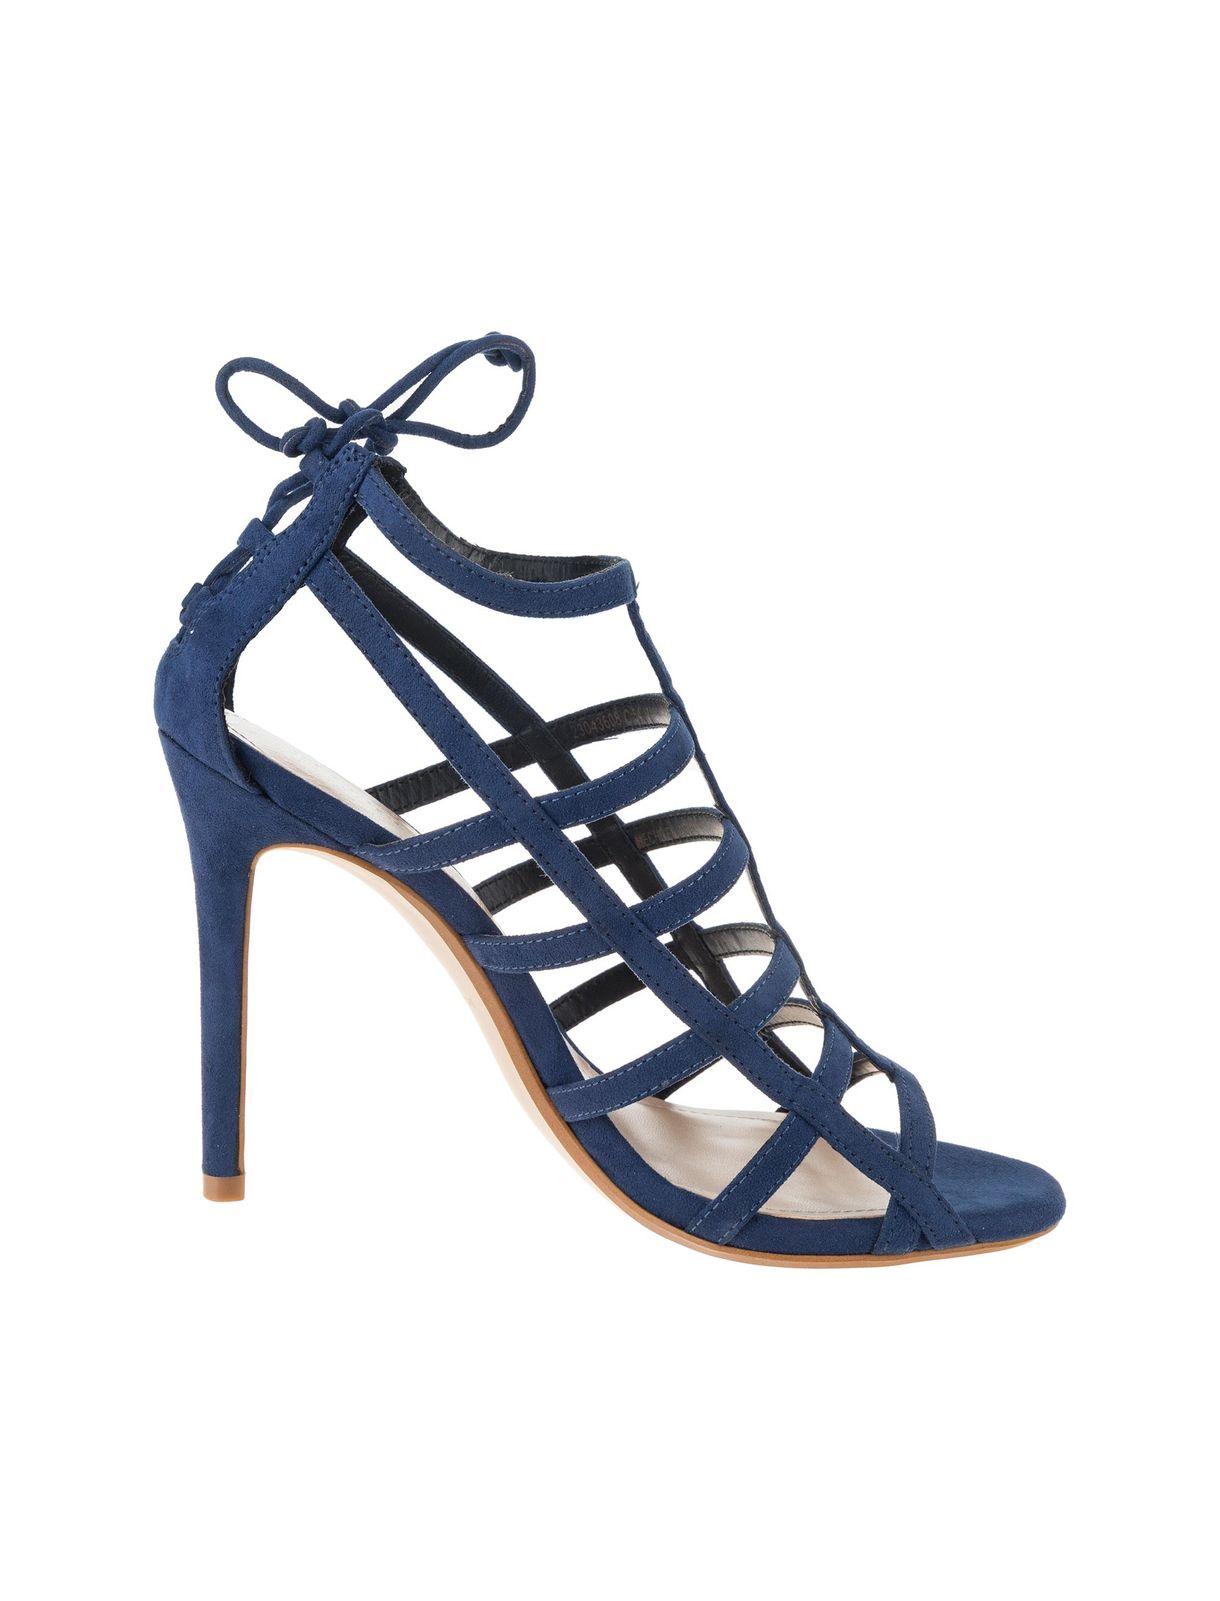 کفش پاشنه بلند زنانه – مانگو  Women High Heels Shoes – Mango